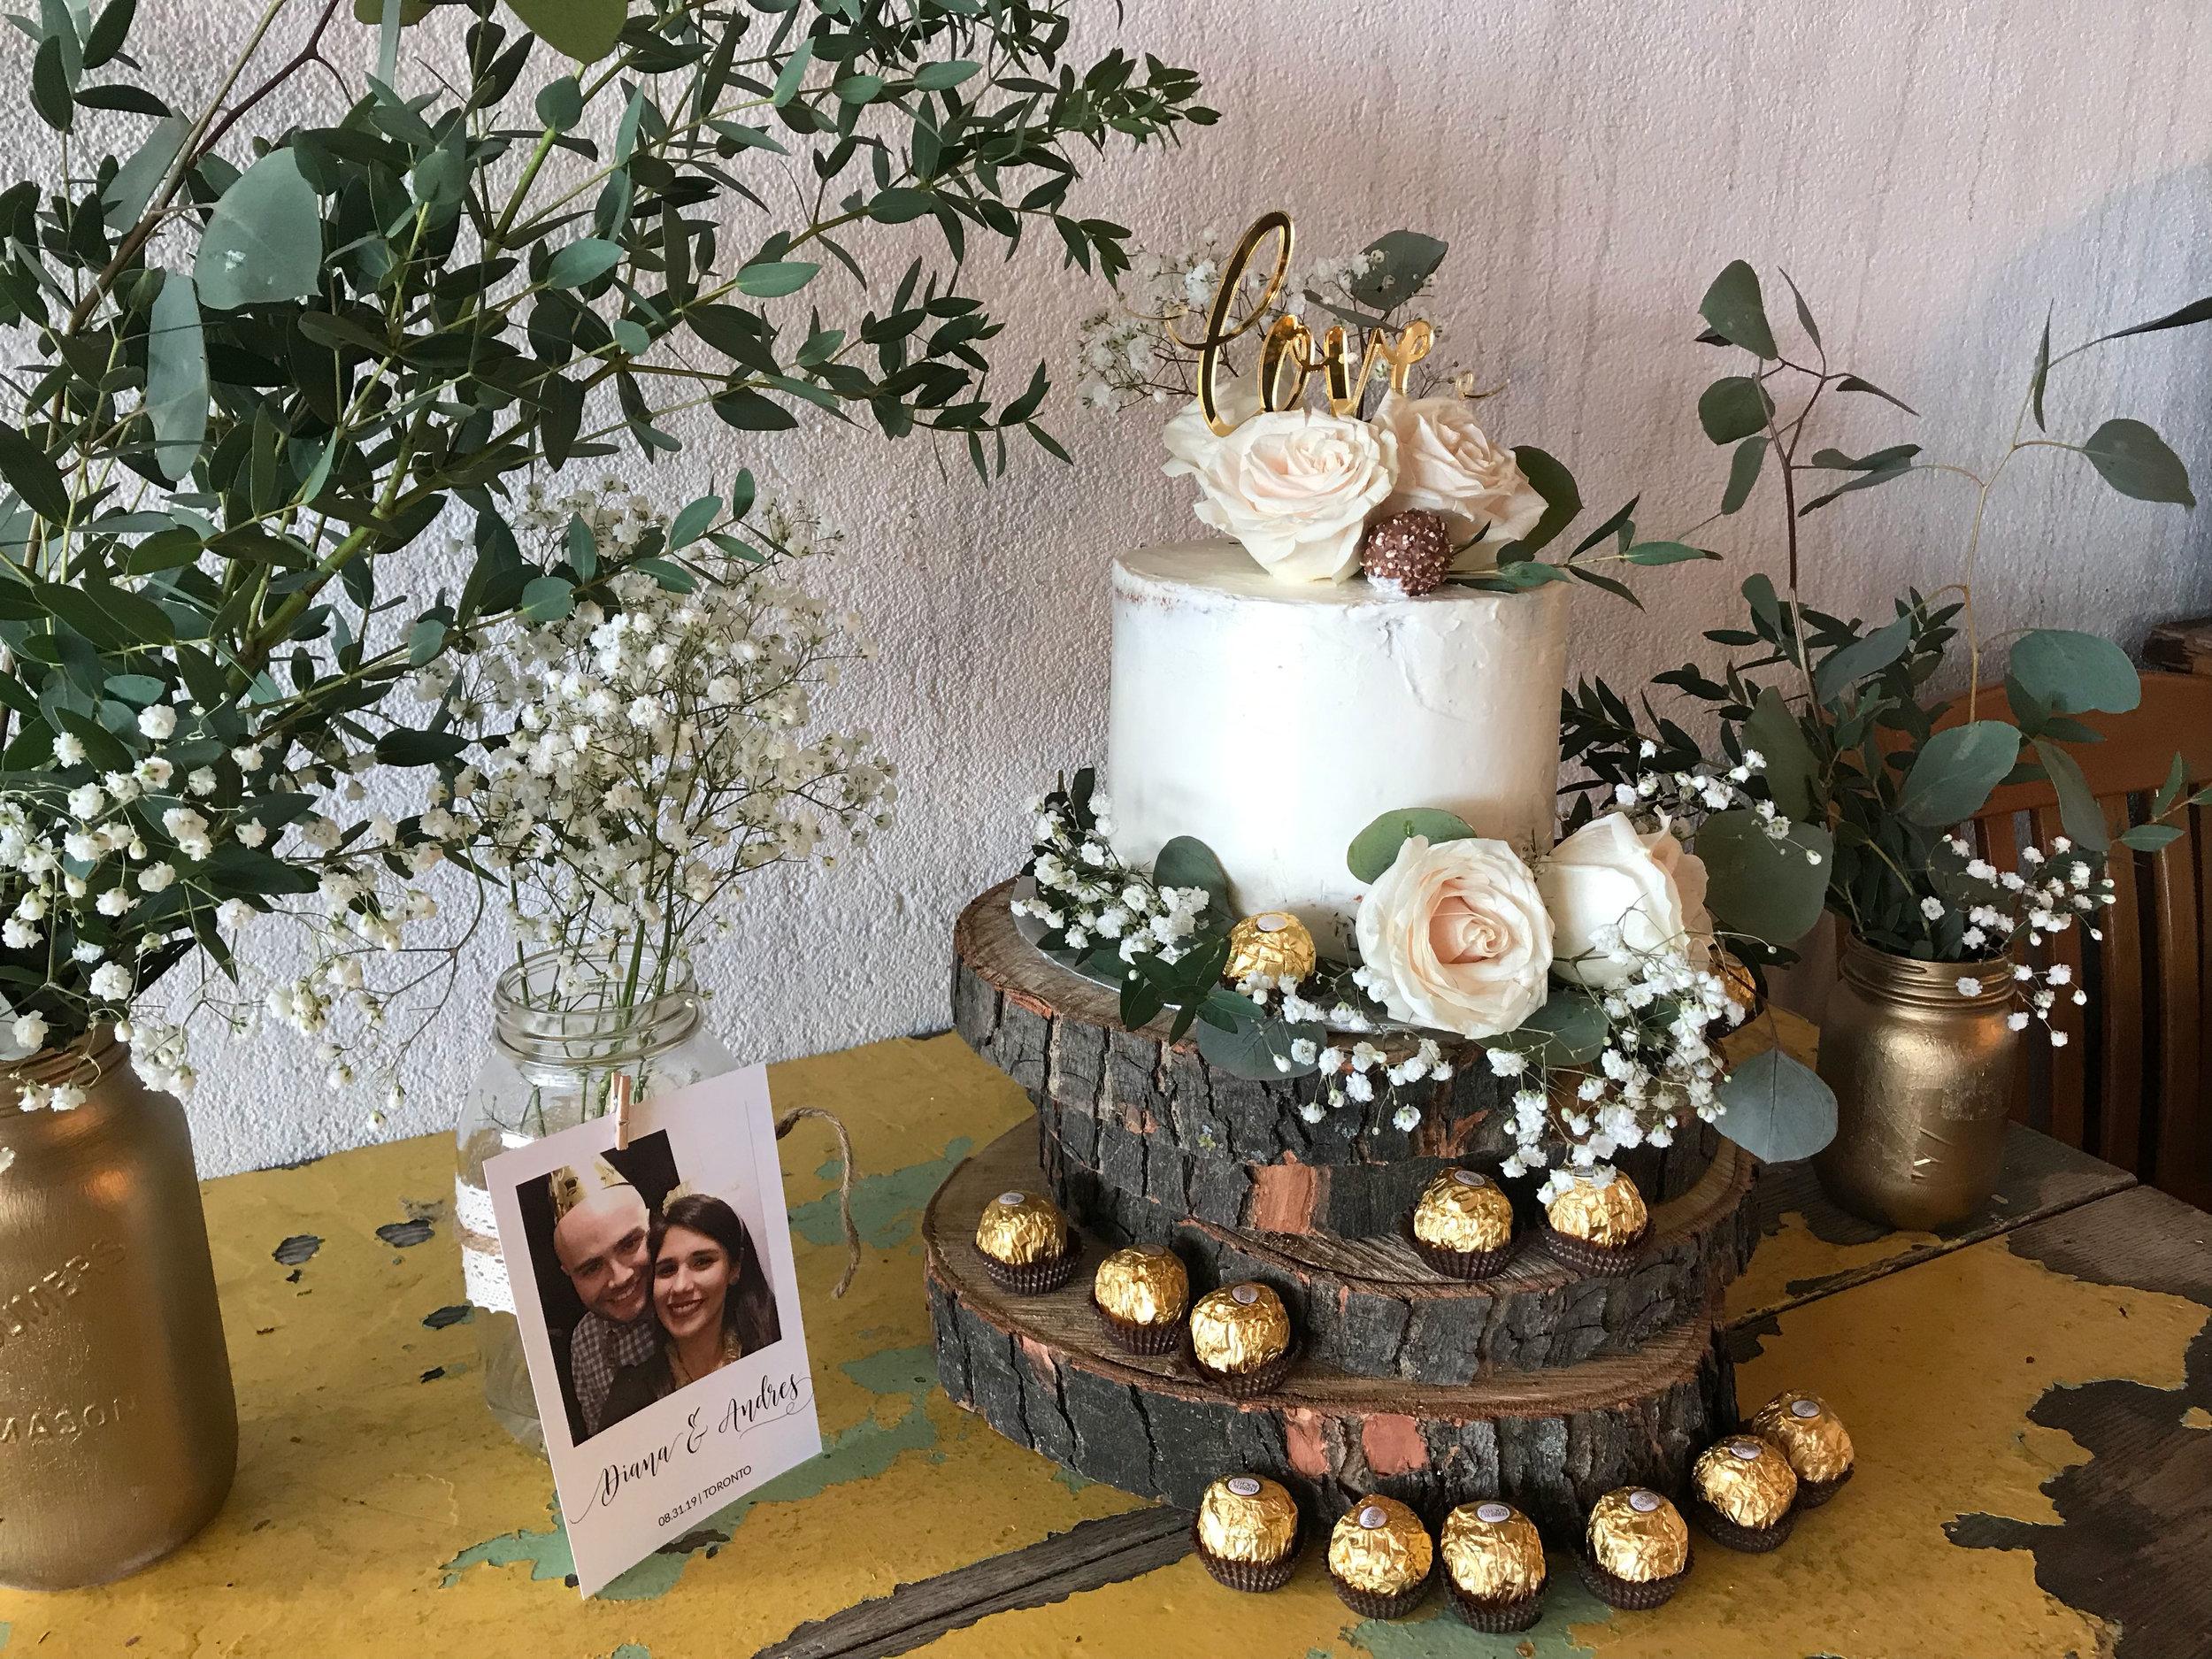 diana-andres-rustic-harvest-cake-table-naked-cake-eucalyptus-wooden-discs-ferrero-rocher-cake-topper-love-polaroid-mason-jar-centerpeices-greenery-tyscany-wedding.jpg